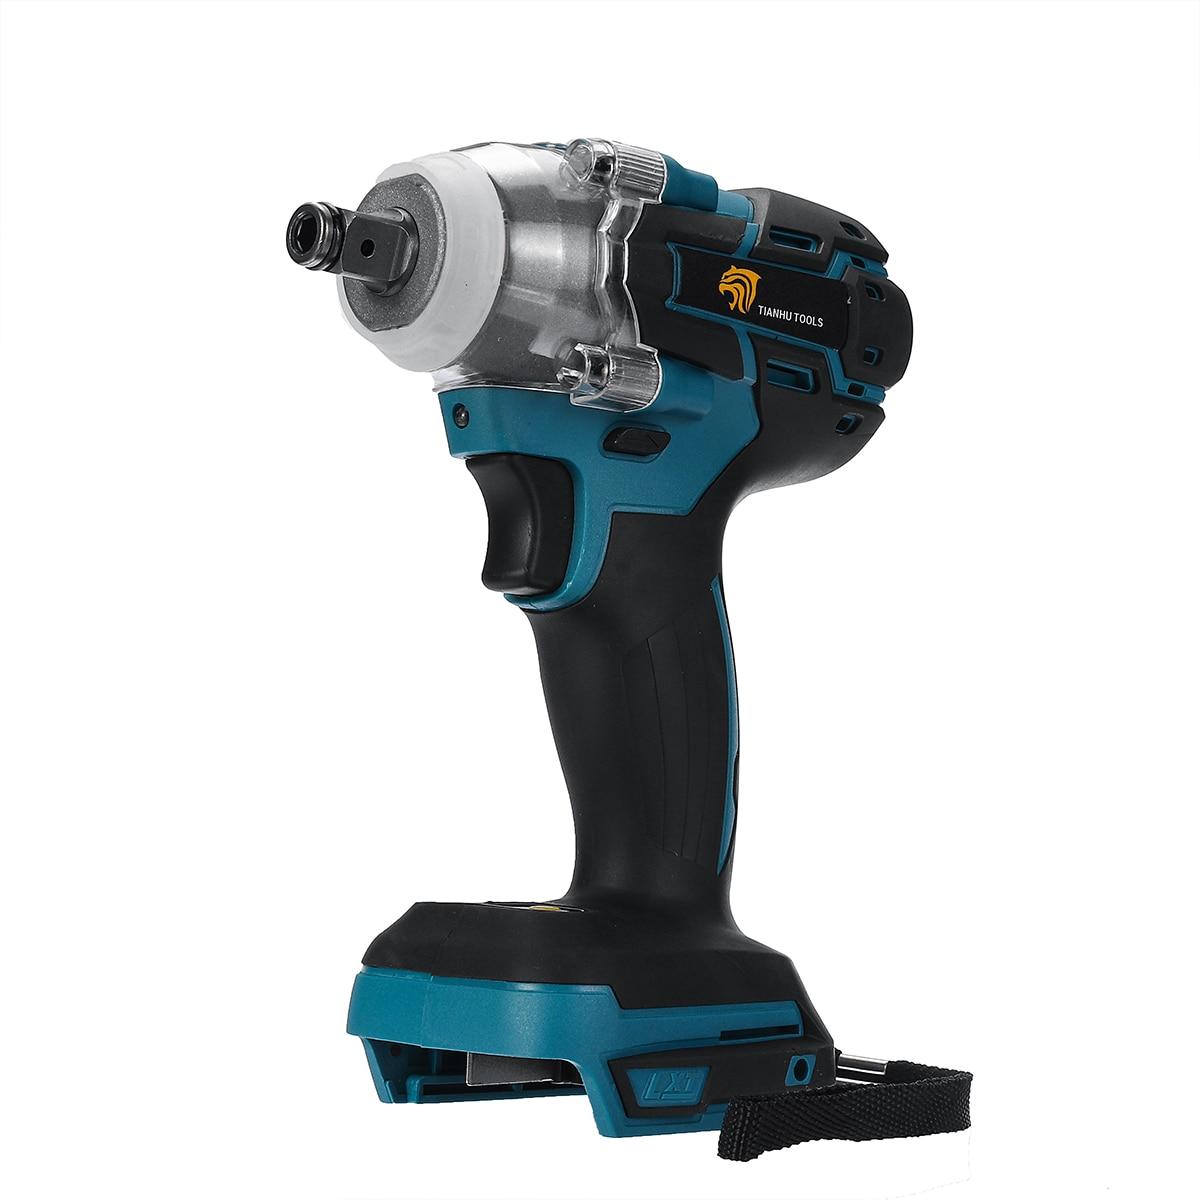 18V Electric Cordless Brushless Impact Wrench